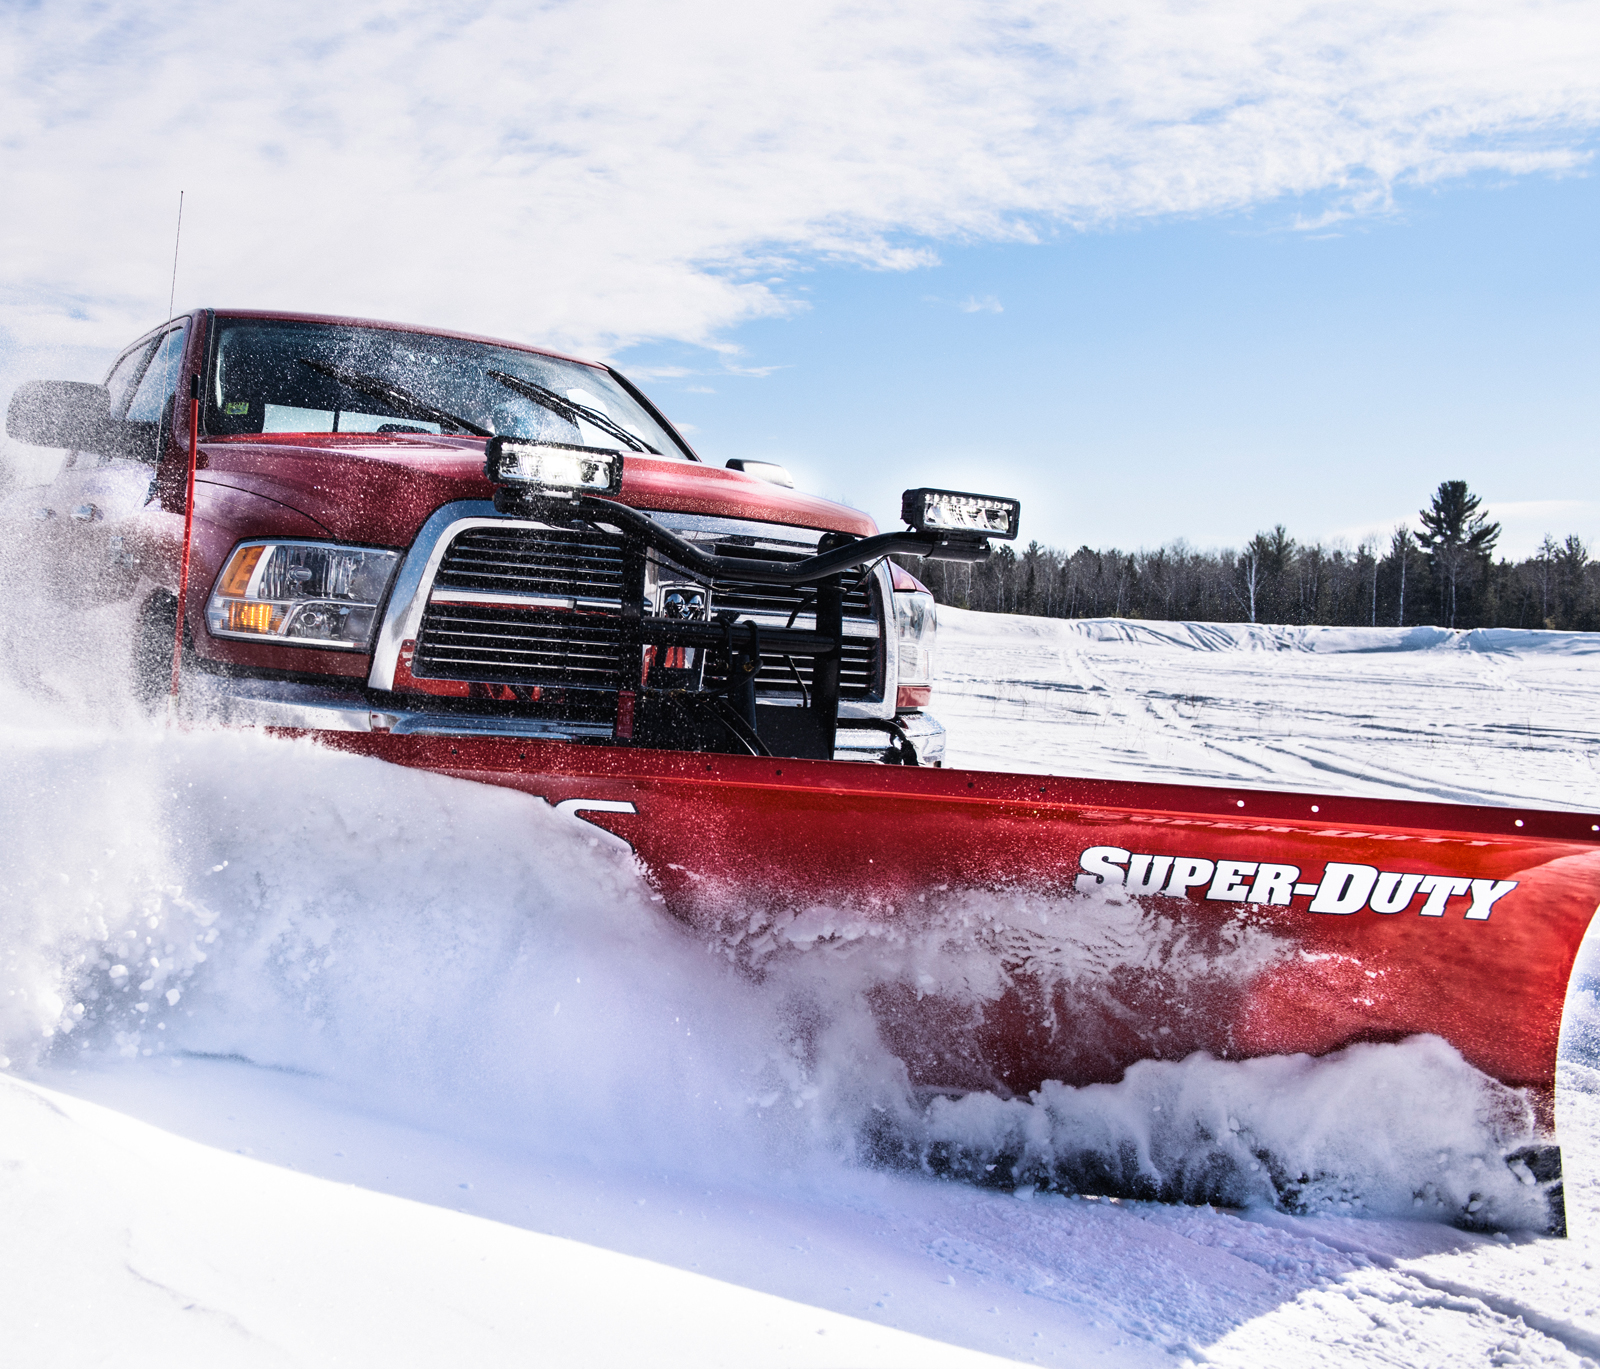 medium resolution of super duty plows boss snowplowboss plow wiring diagram ford f650 18